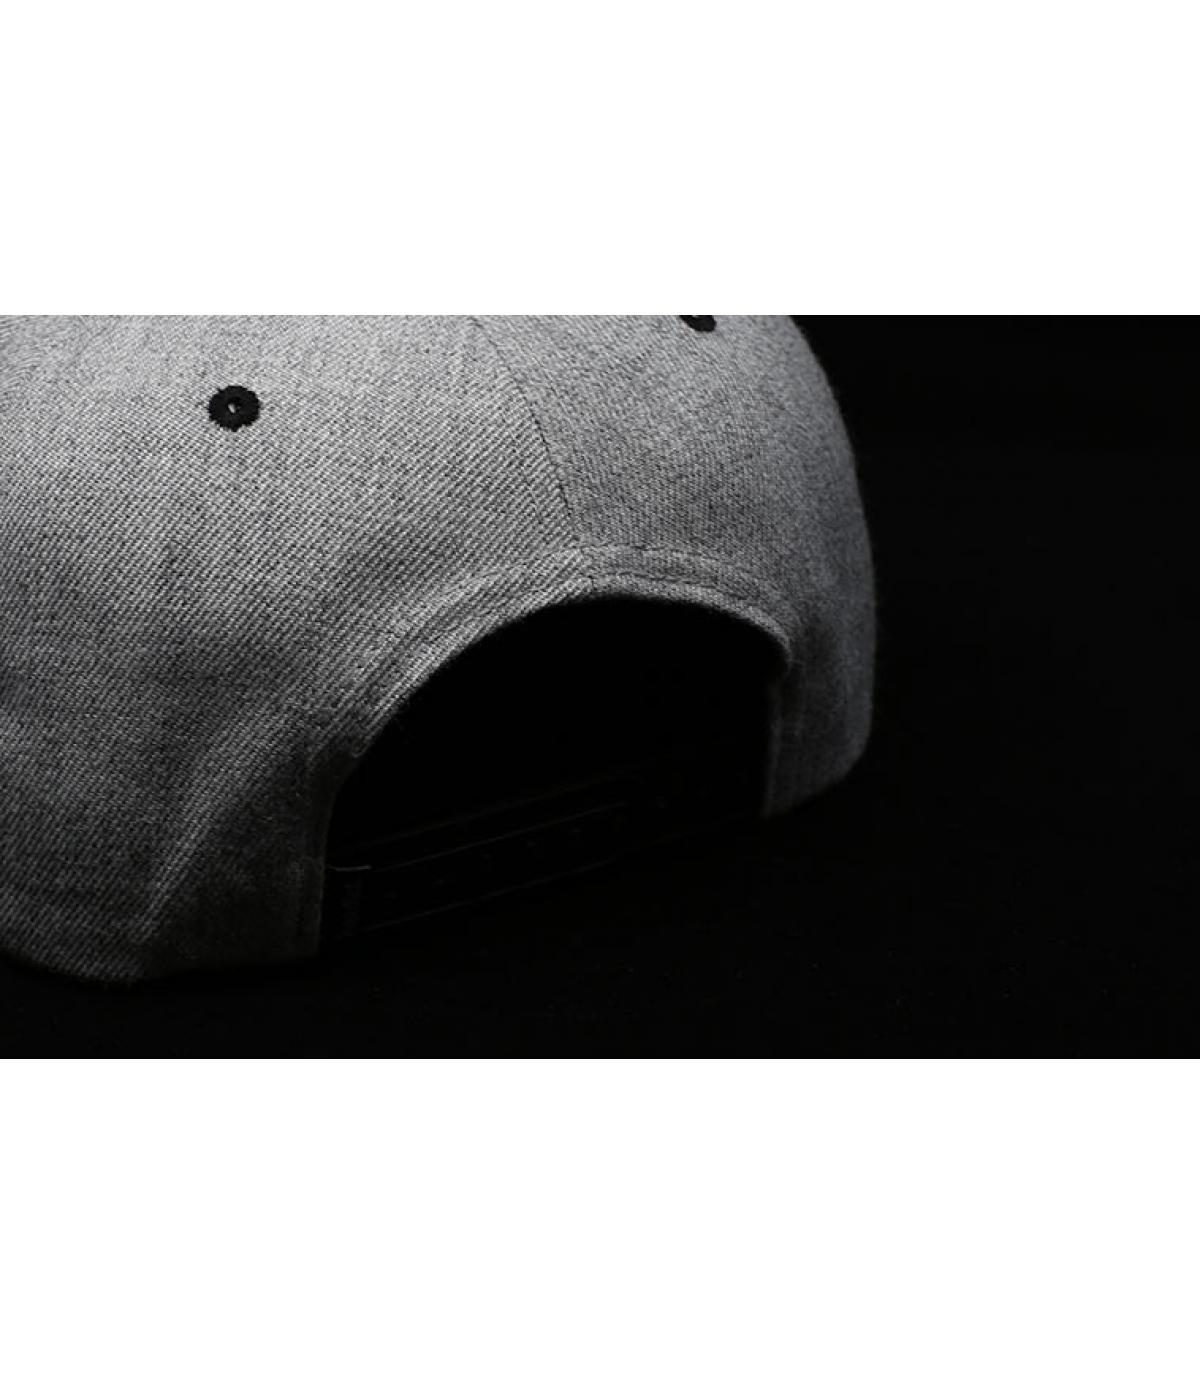 Details Snapback Fuel & Fire - Abbildung 6